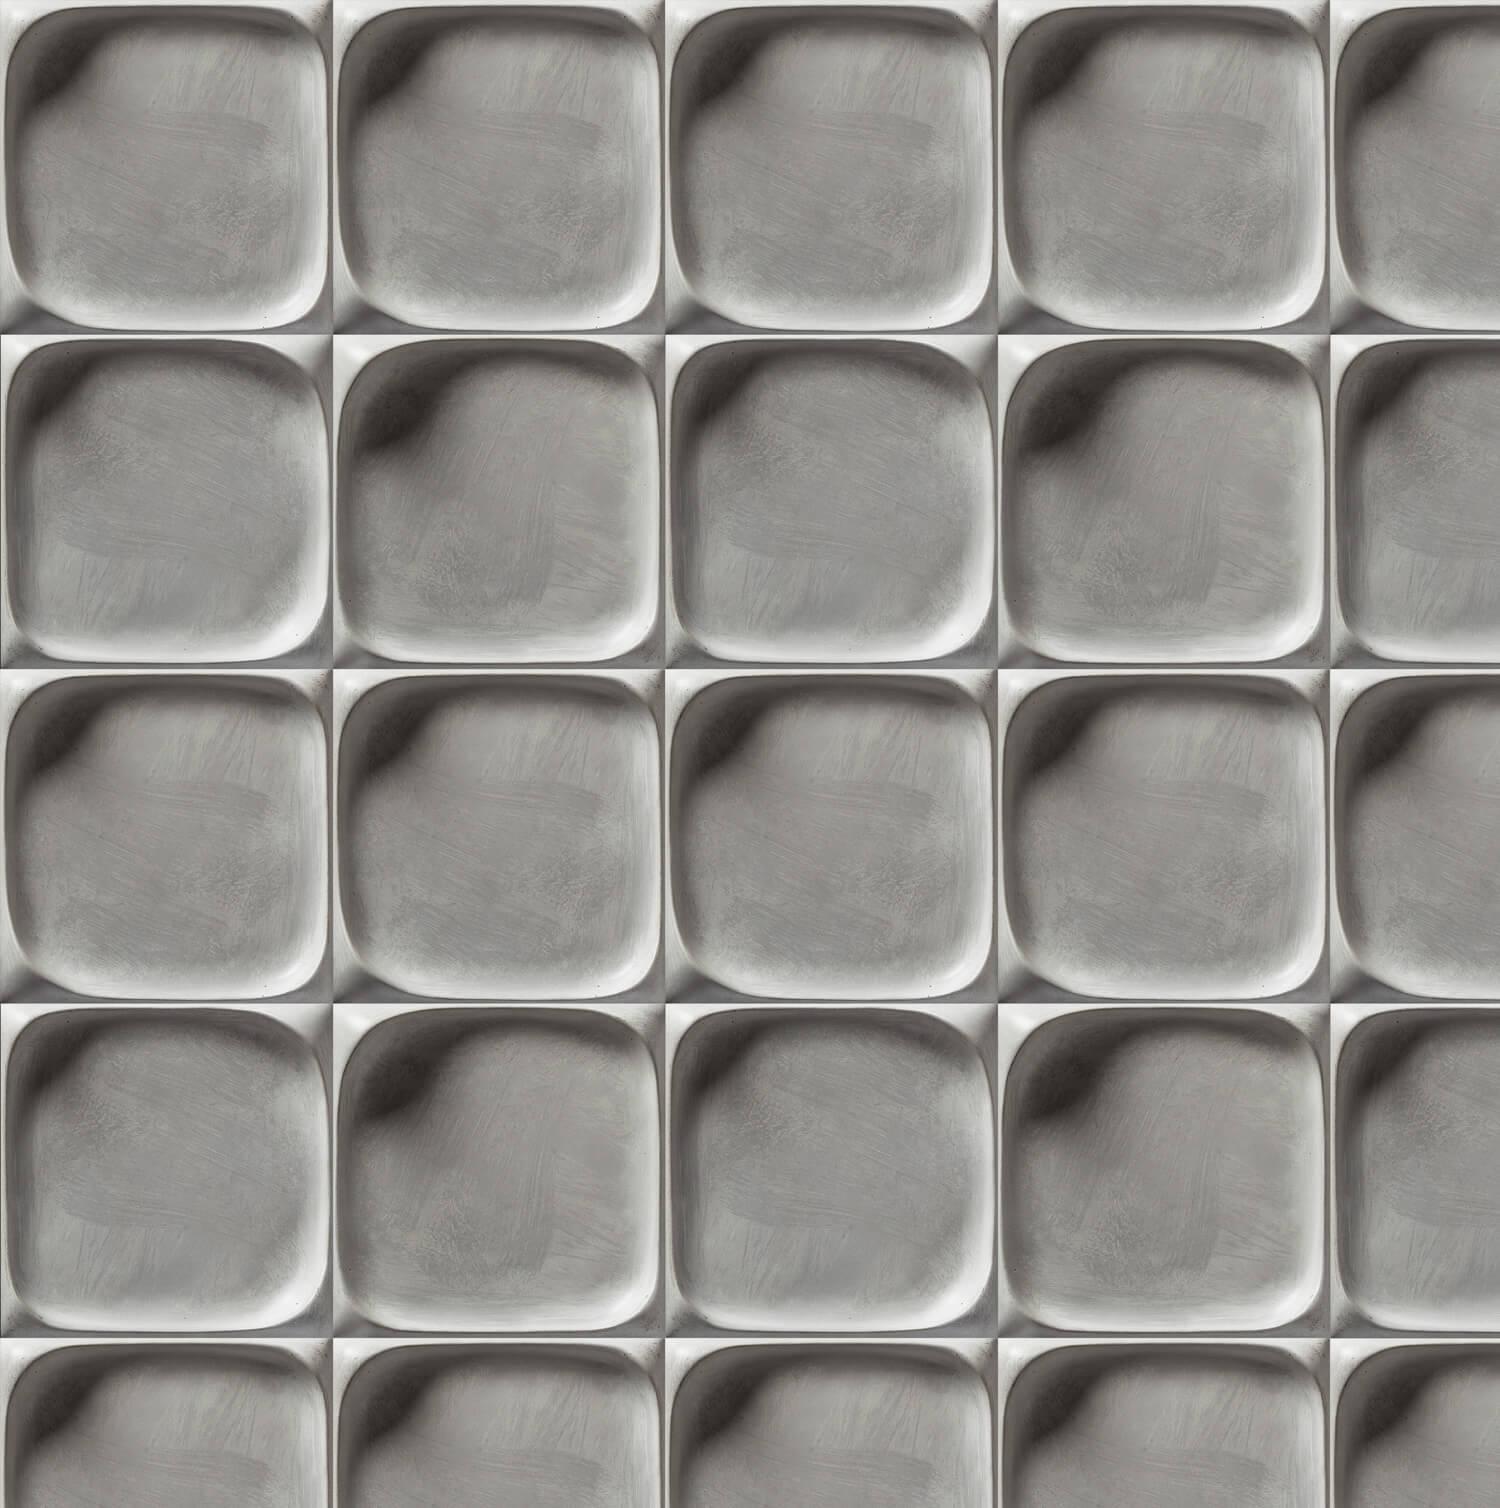 Plaster_studio_tile_sq_01_concrete